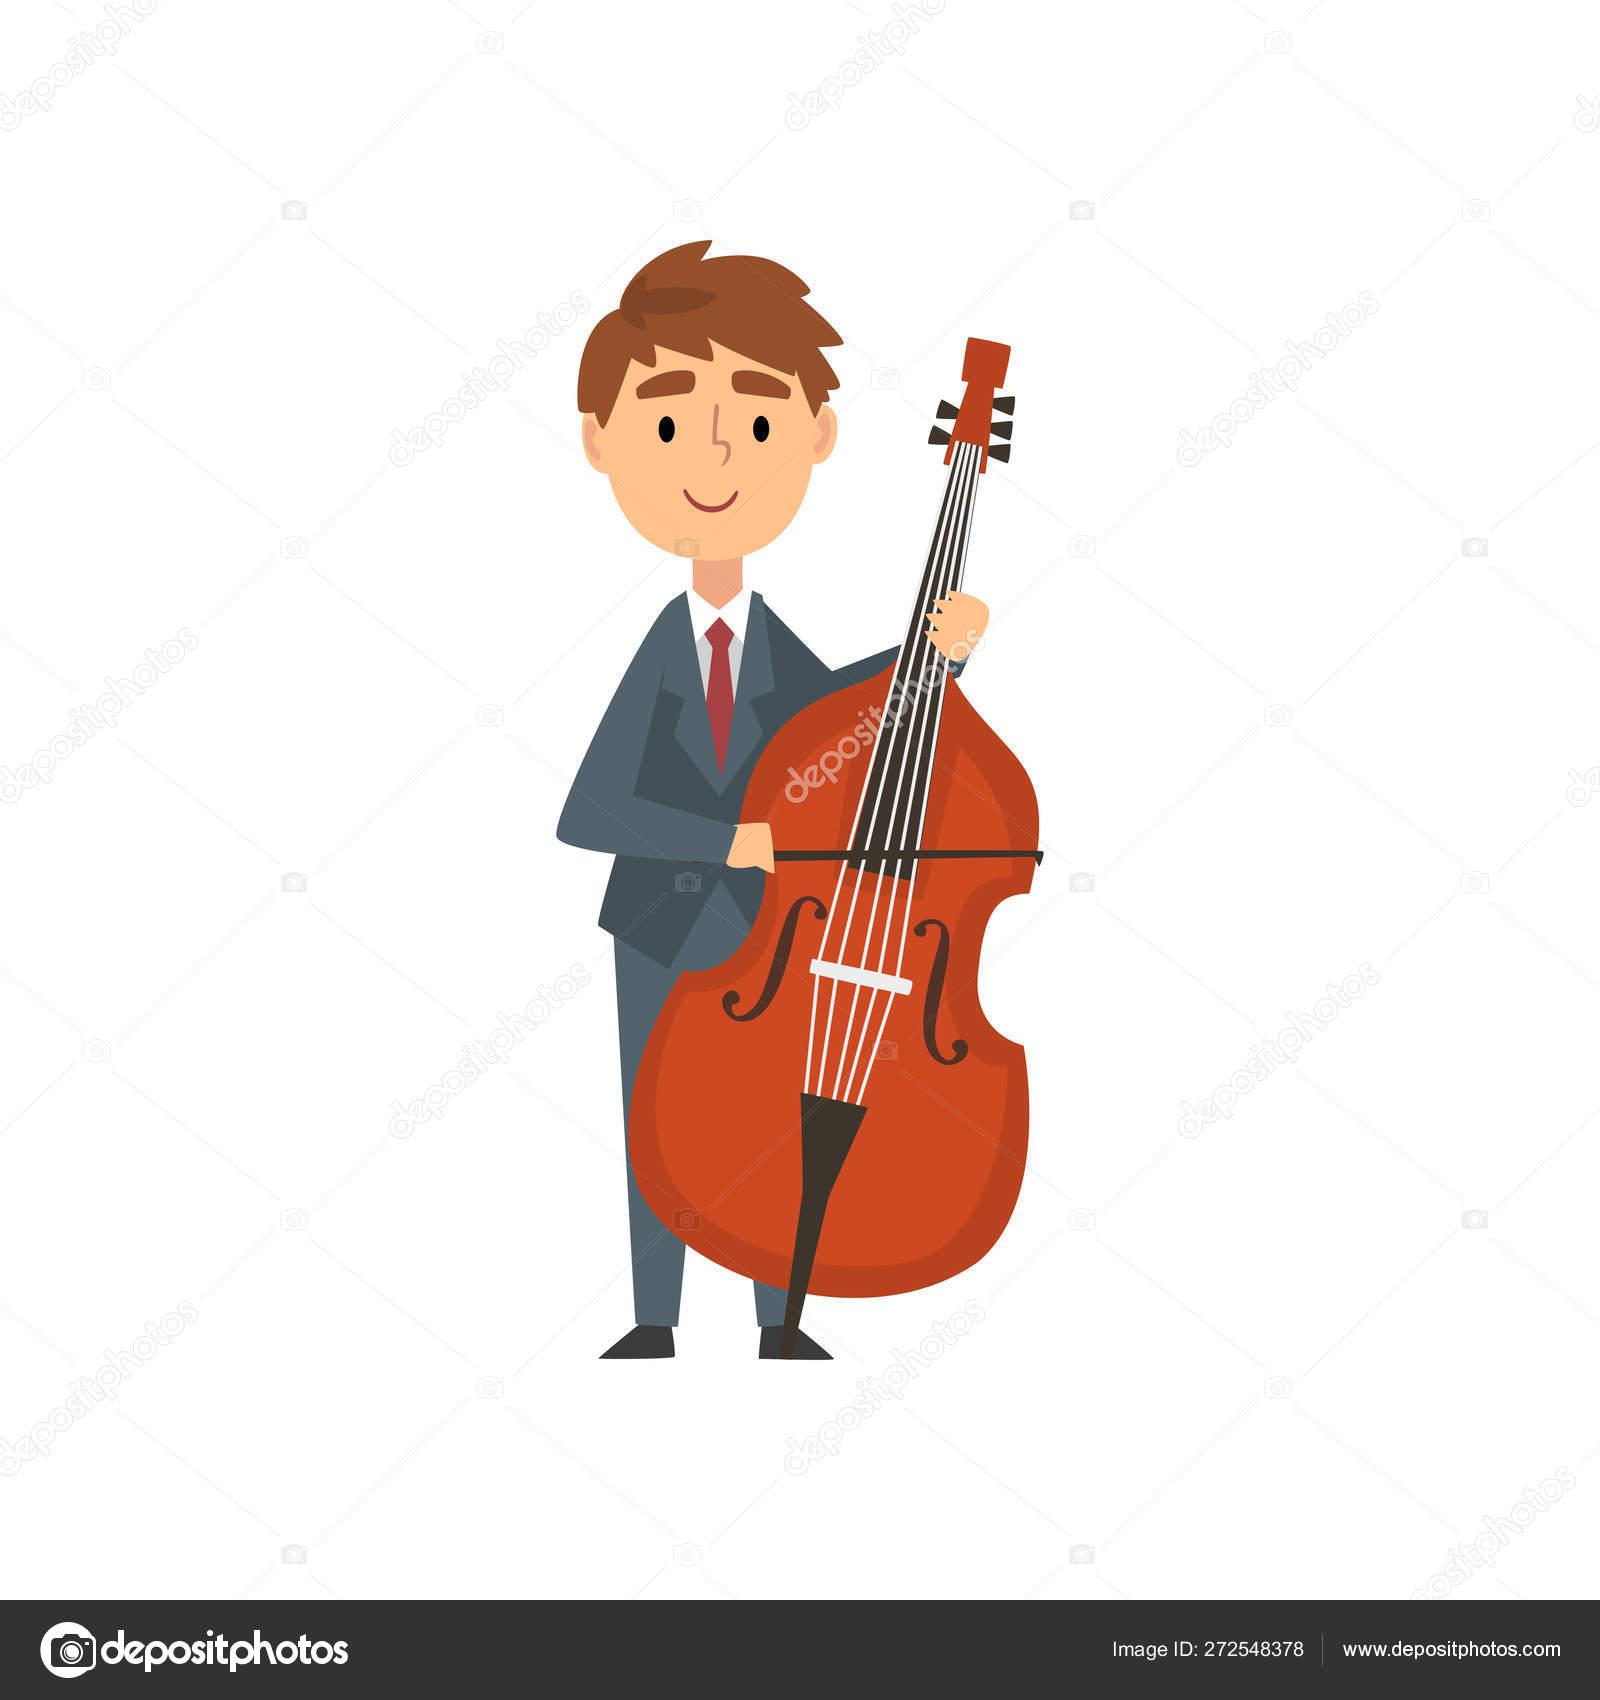 Boy Cello Player Talentoso Joven Personaje Violonchelista